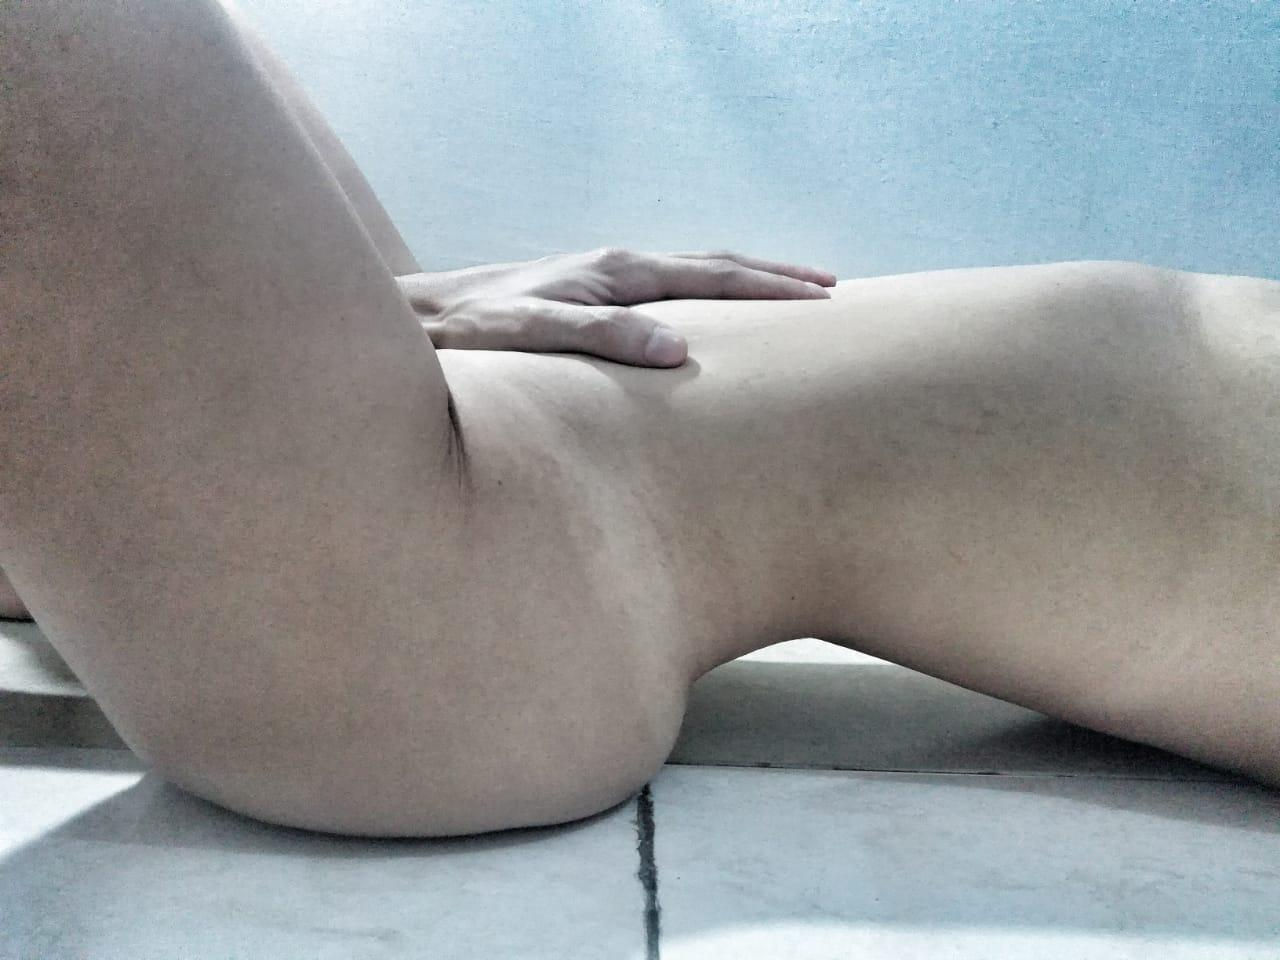 Sex horny?s=thwb6gzj7si9+6ppybpcbdslmozrkthvmodvuq1u030=